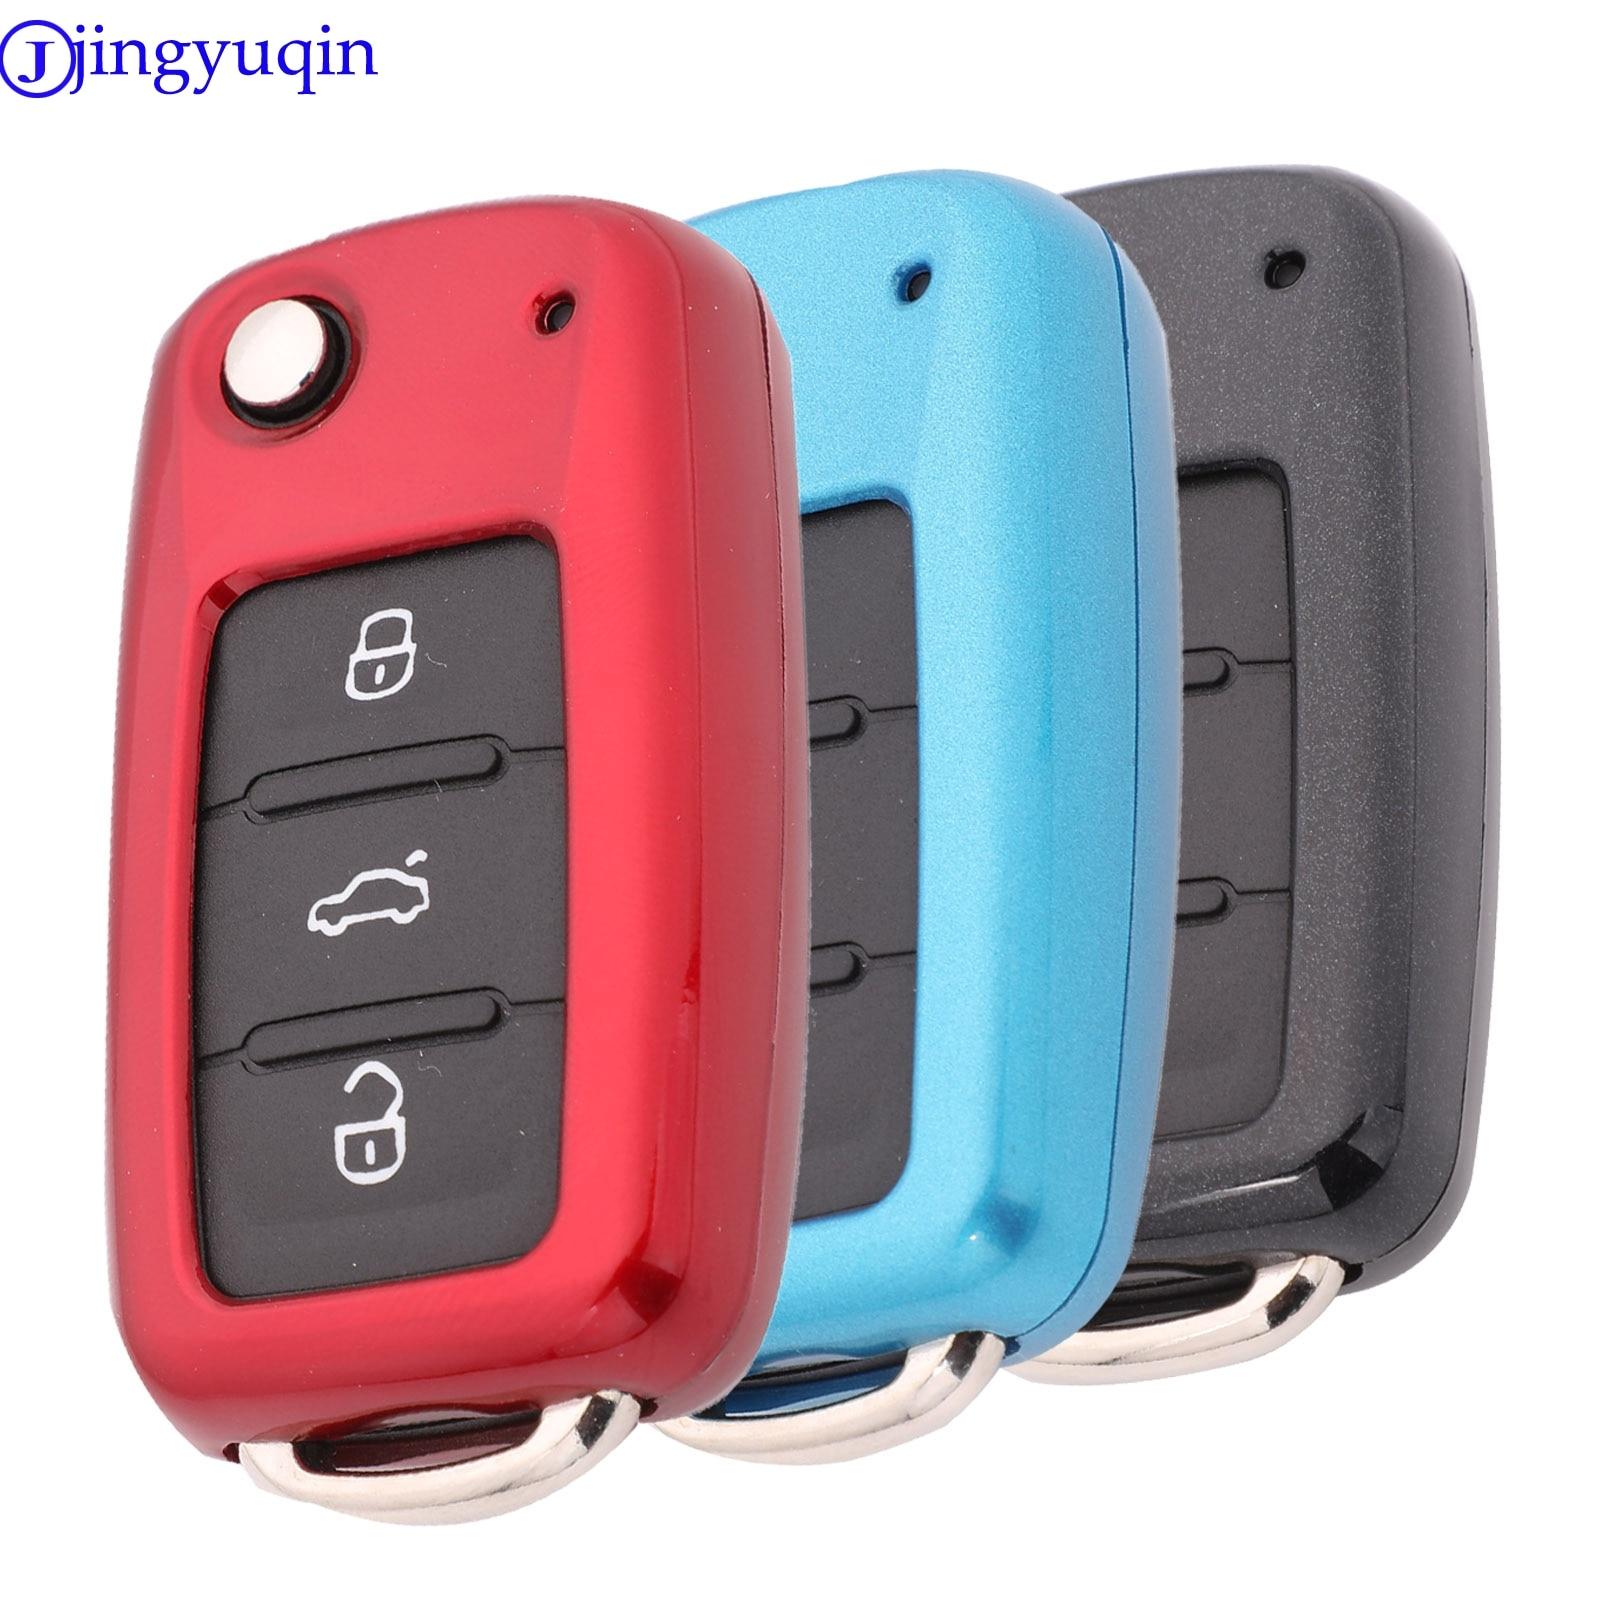 Jingyuqin Car Key Cover Case For VW Golf Bora Jetta POLO GOLF Passat For Skoda Octavia A5 Fabia For SEAT Ibiza Leon